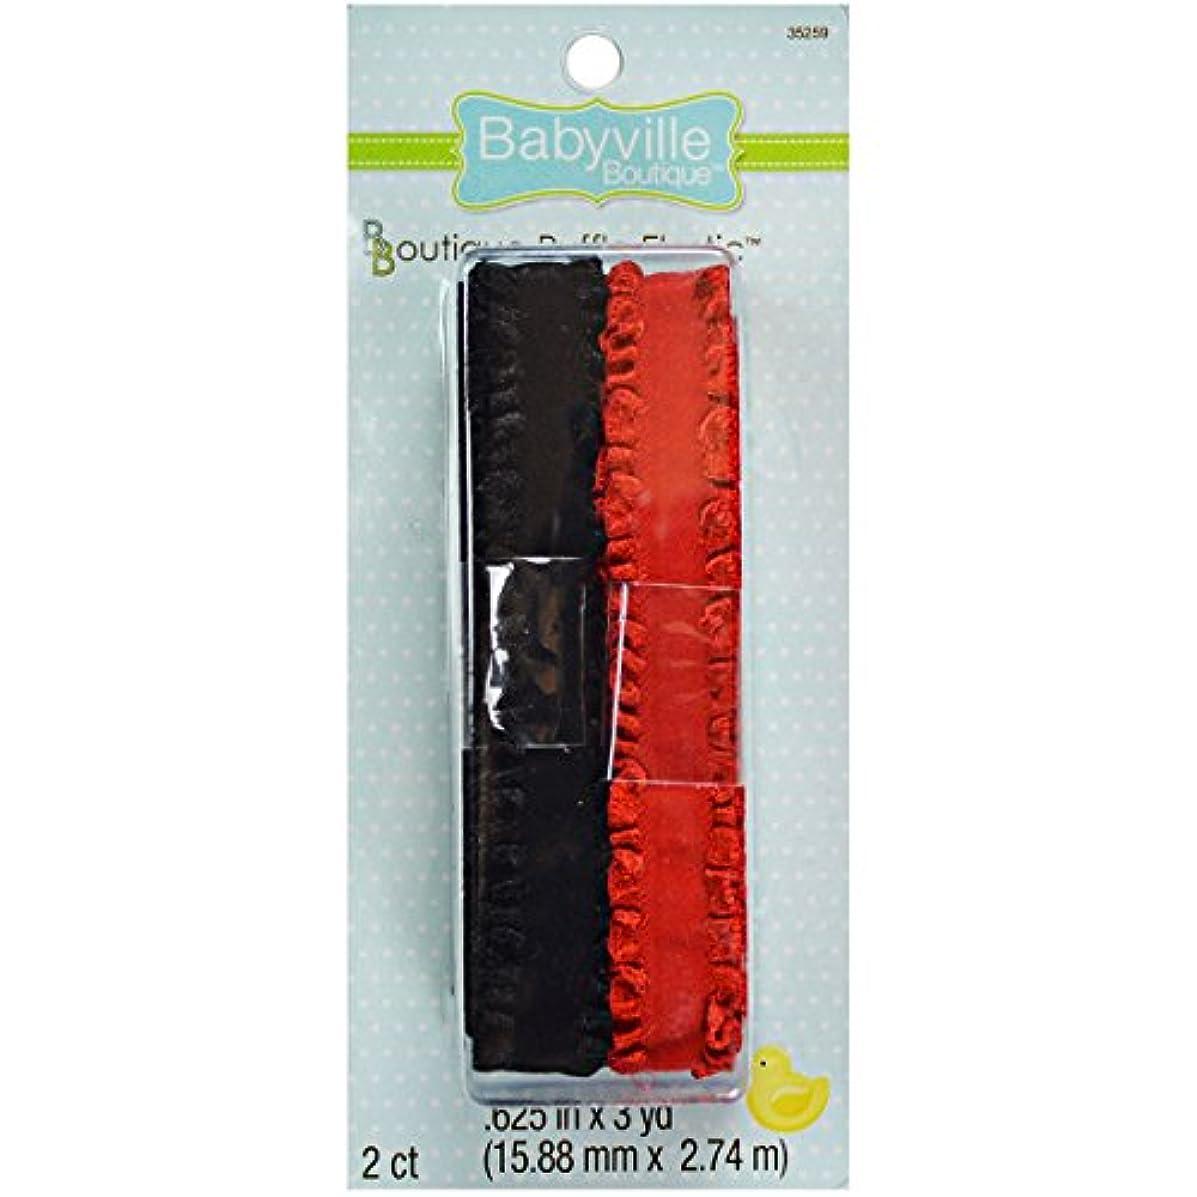 Babyville Boutique 35259 Elastic Ruffle, Red/Black